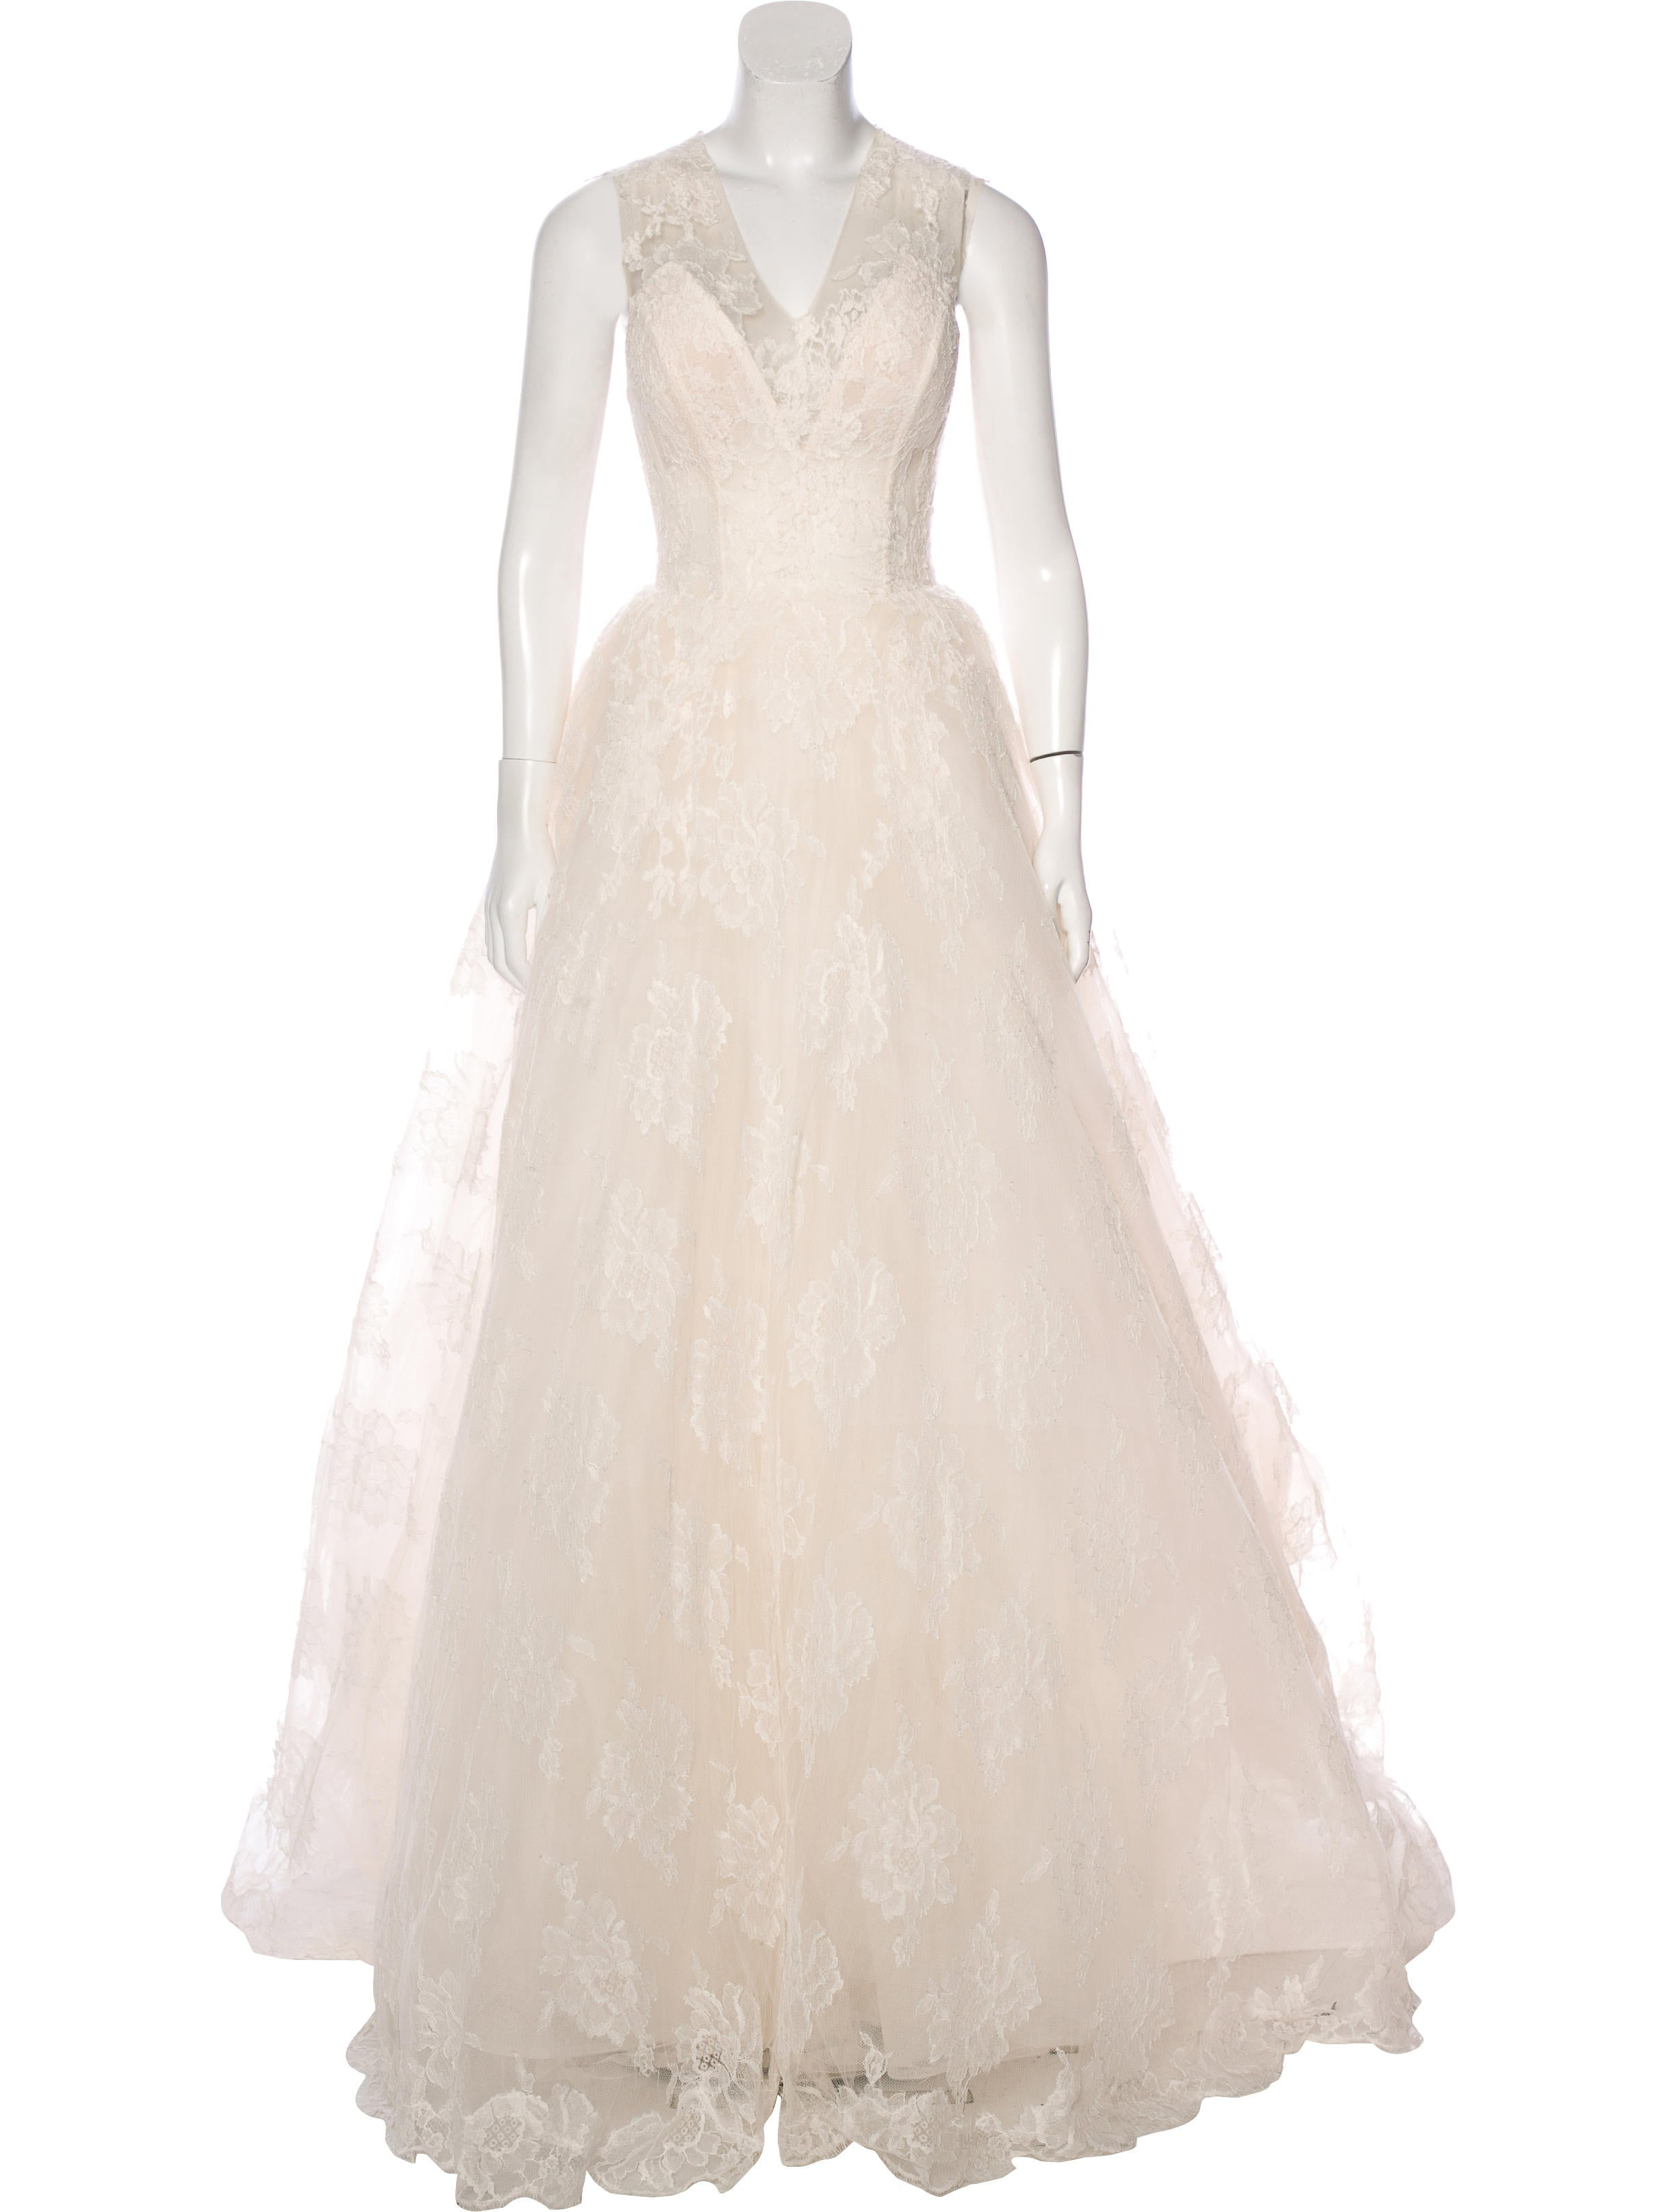 Monique lhuillier chantilly lace wedding gown clothing for Chantilly lace wedding dress